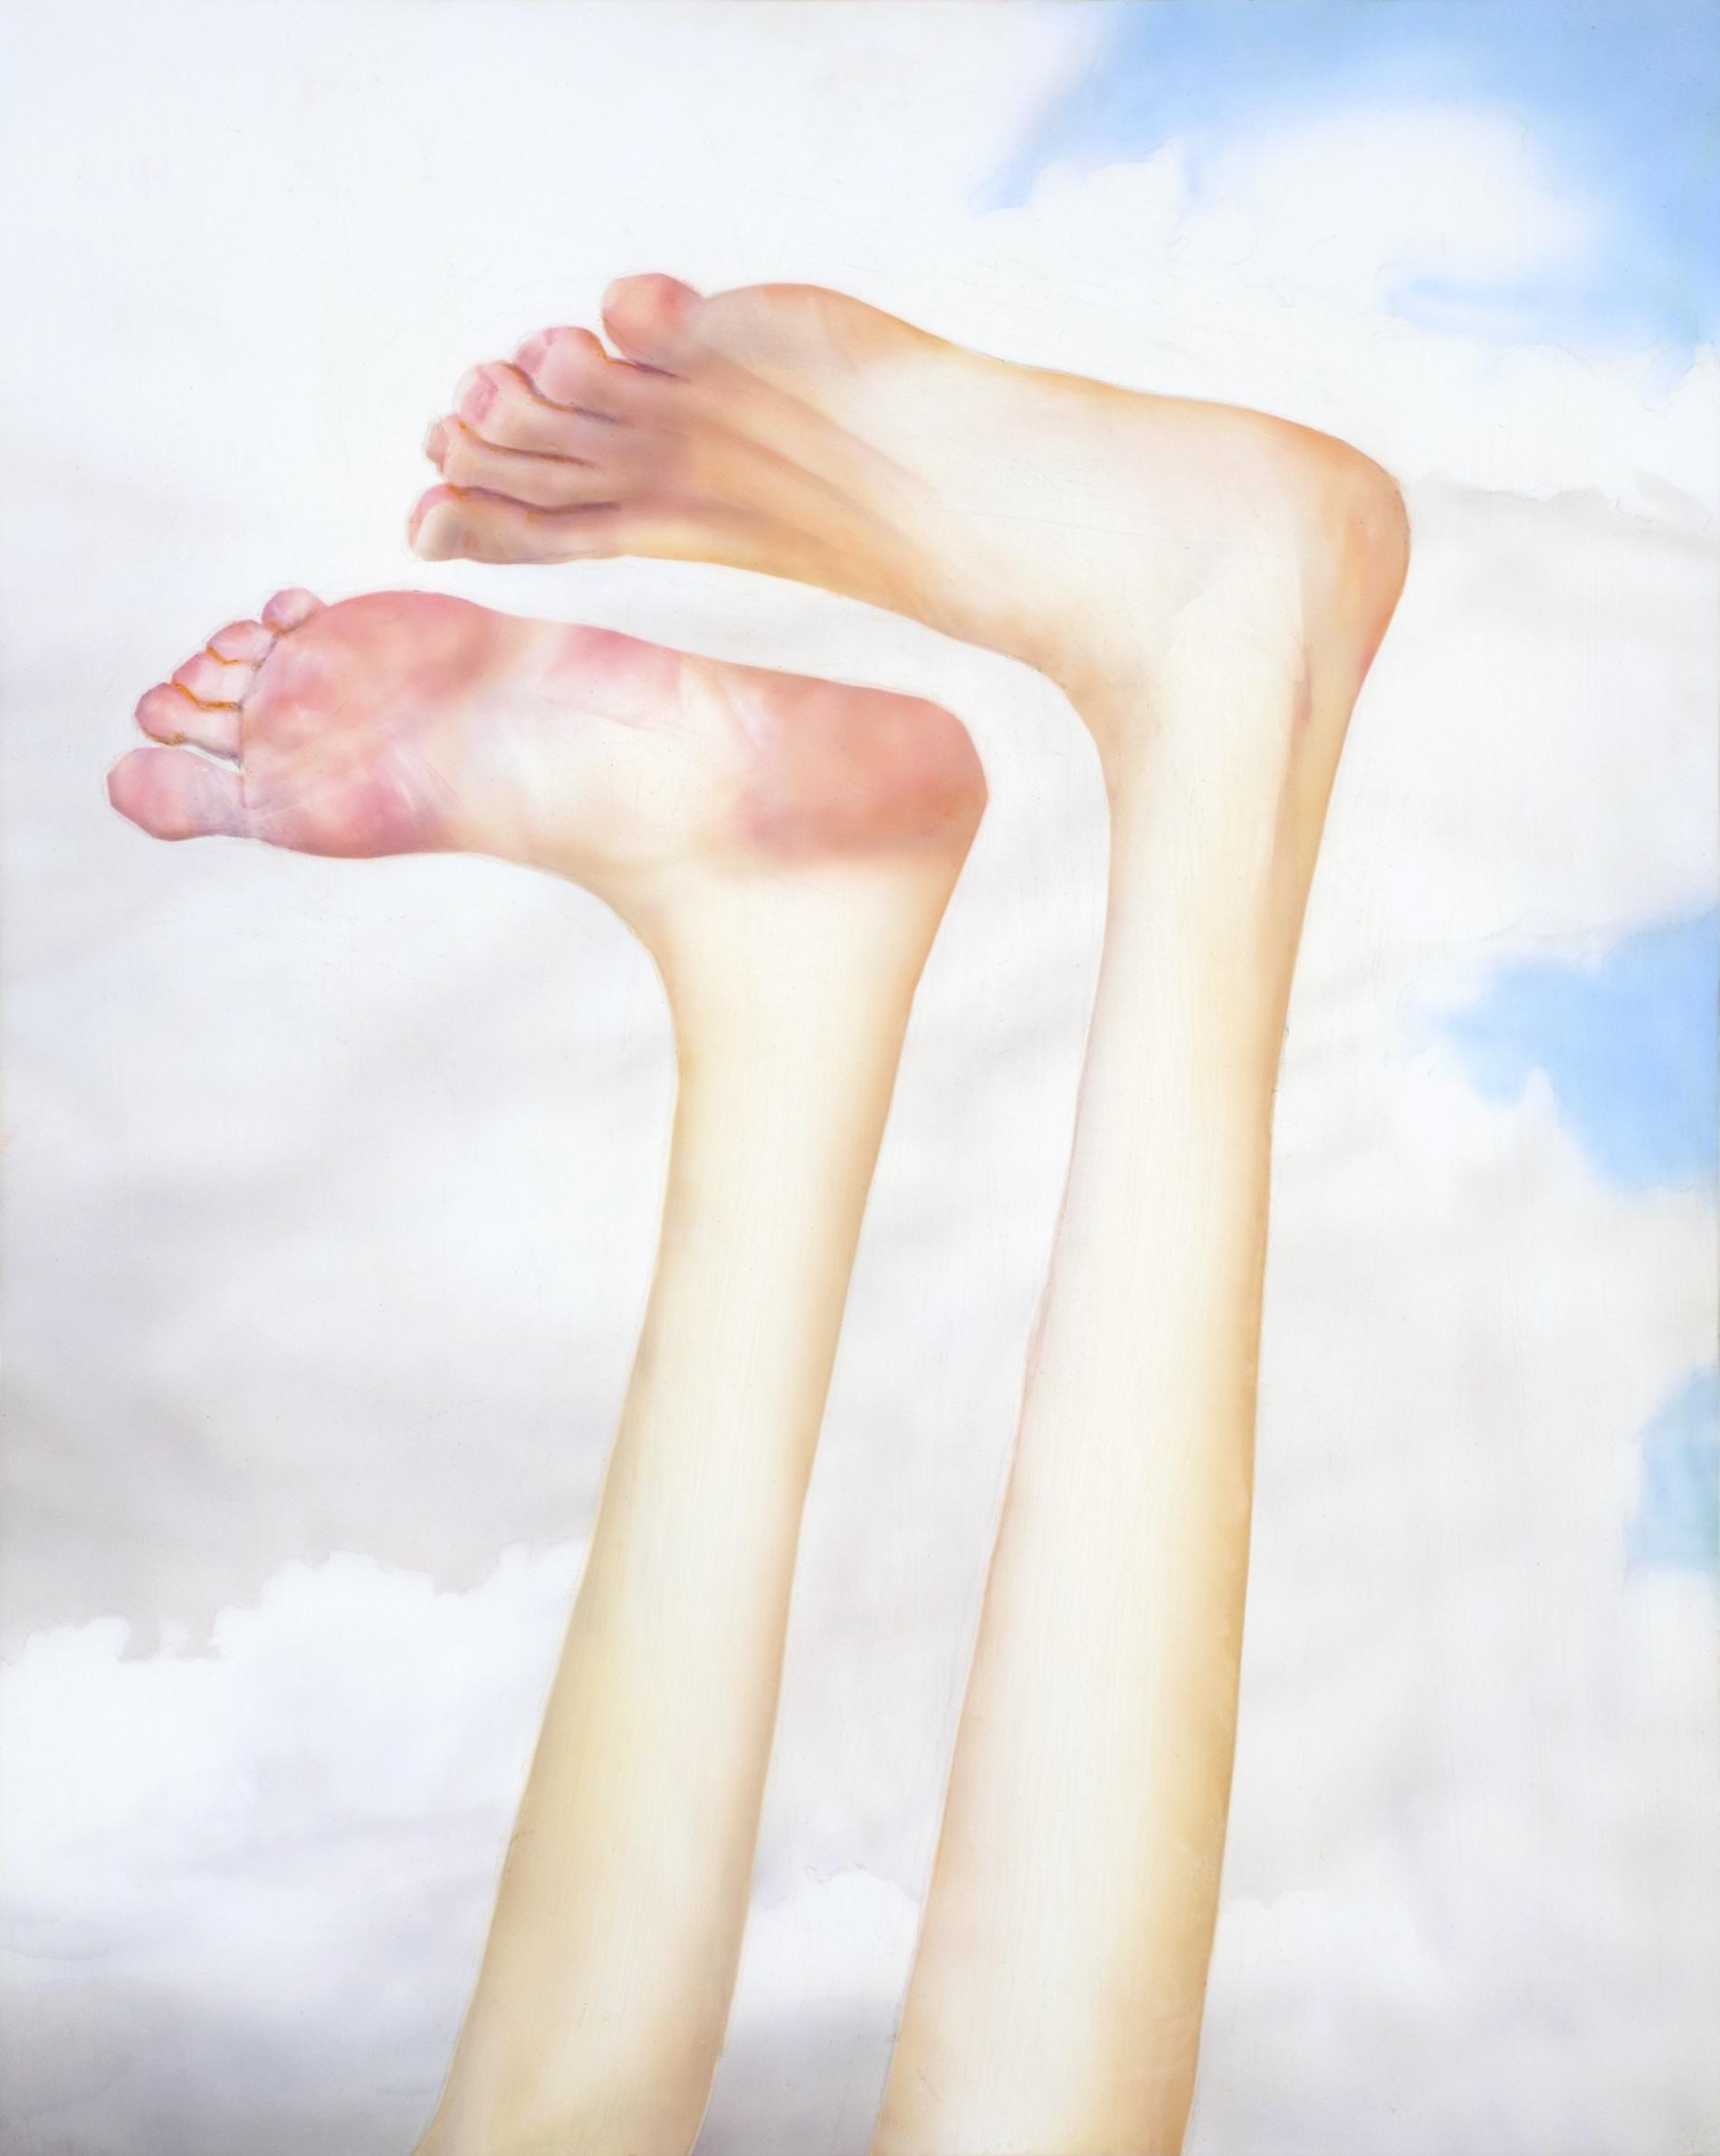 Robert Feintuch  Feet Up,  2013 Polymer emulsion on honeycomb panel 23.75h x 19w in.